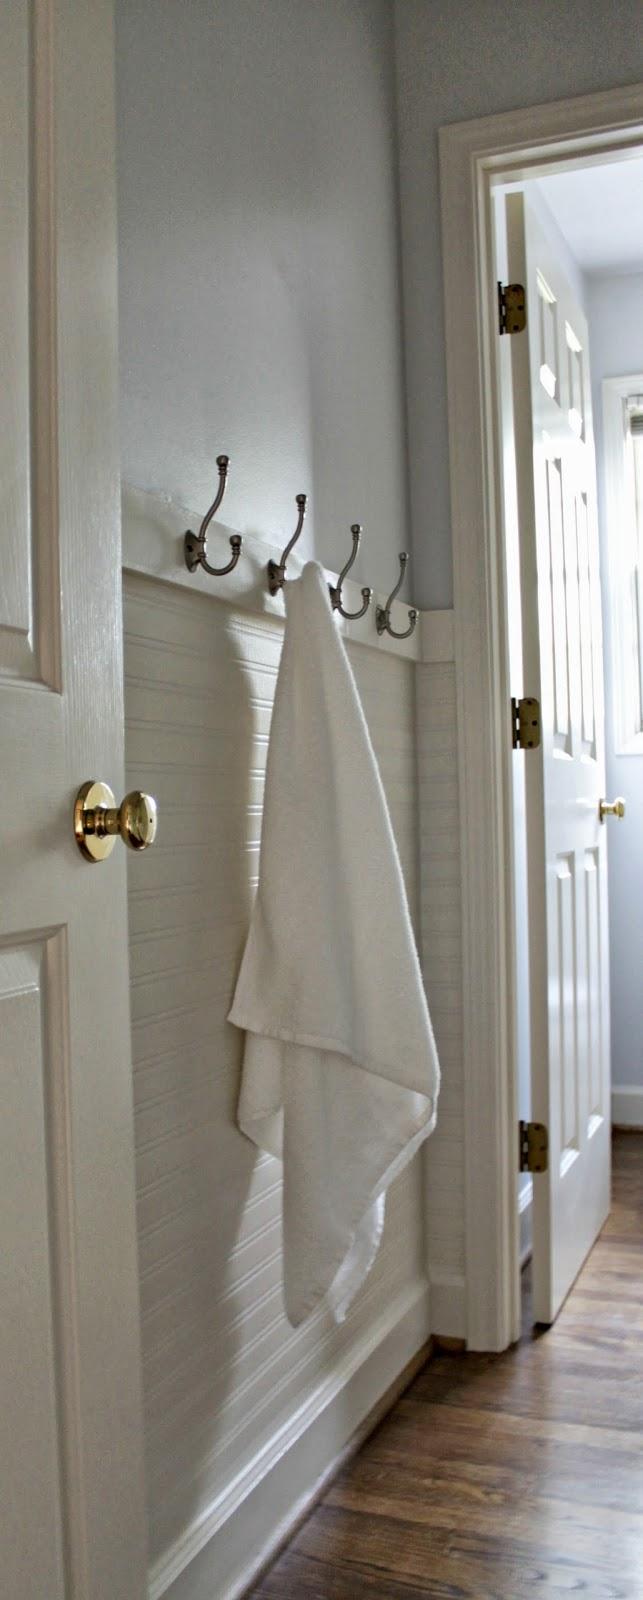 Fresh Paint, Beadboard Wallpaper & Towel Hooks